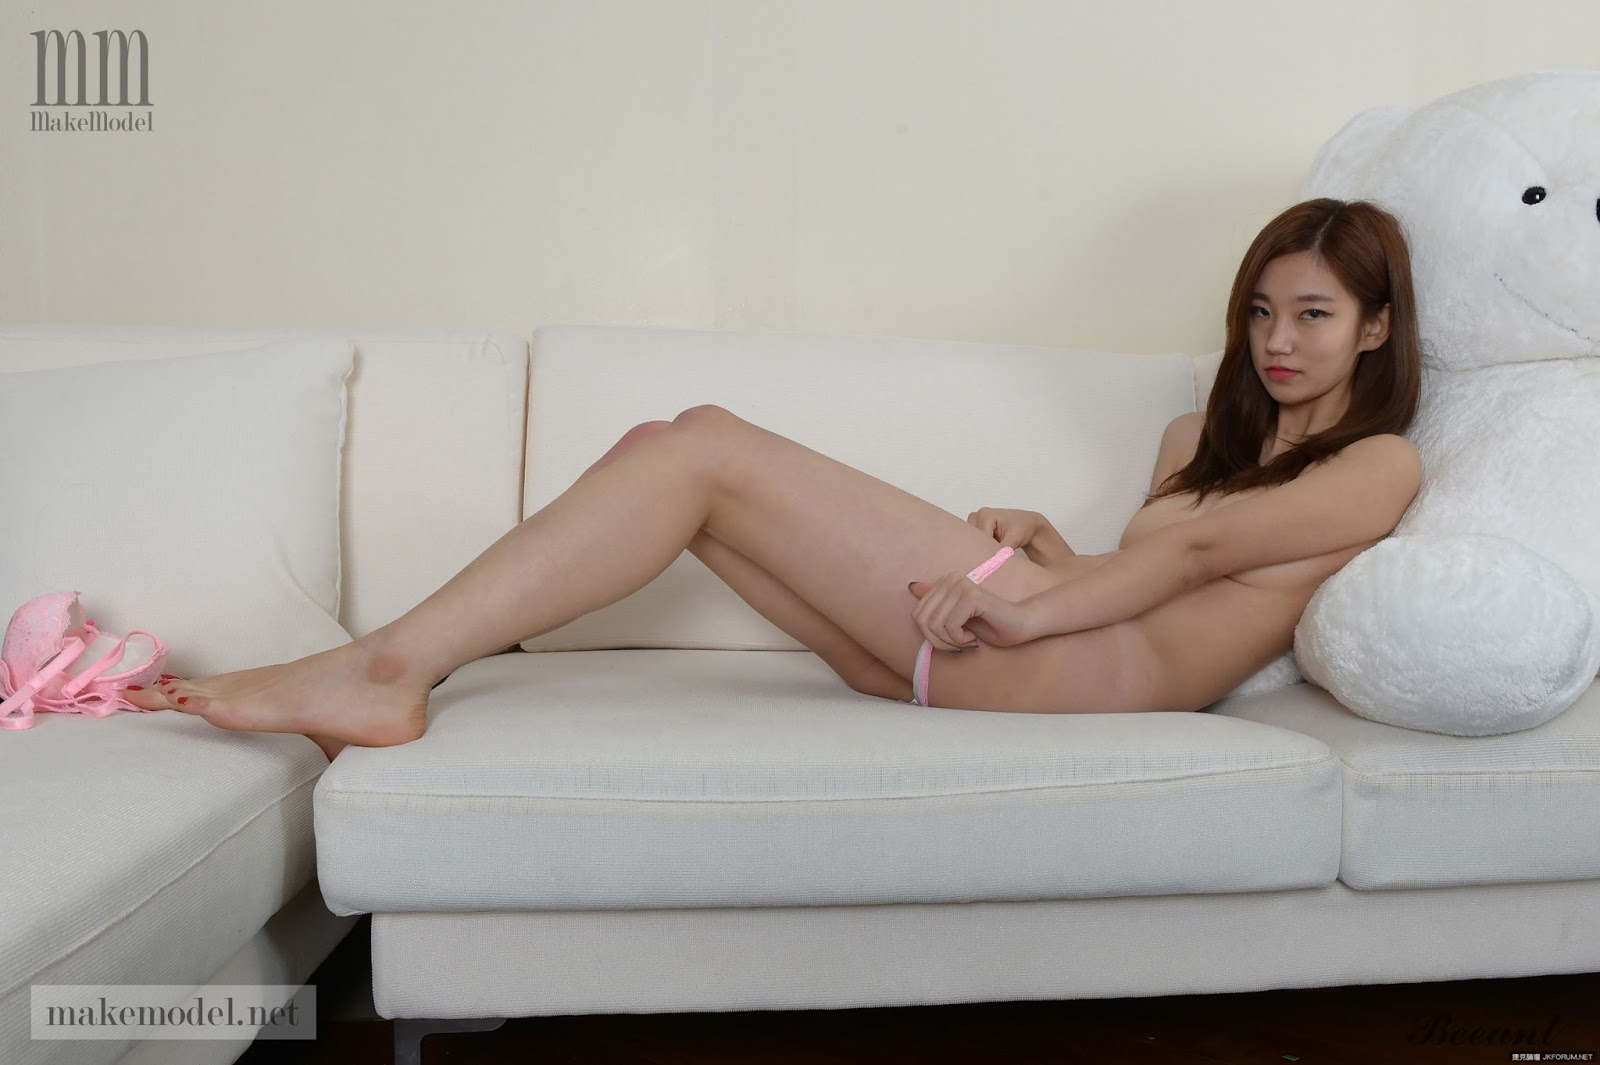 270912 3471 - Korean Nude - Big Albom Remain #A-korean girl